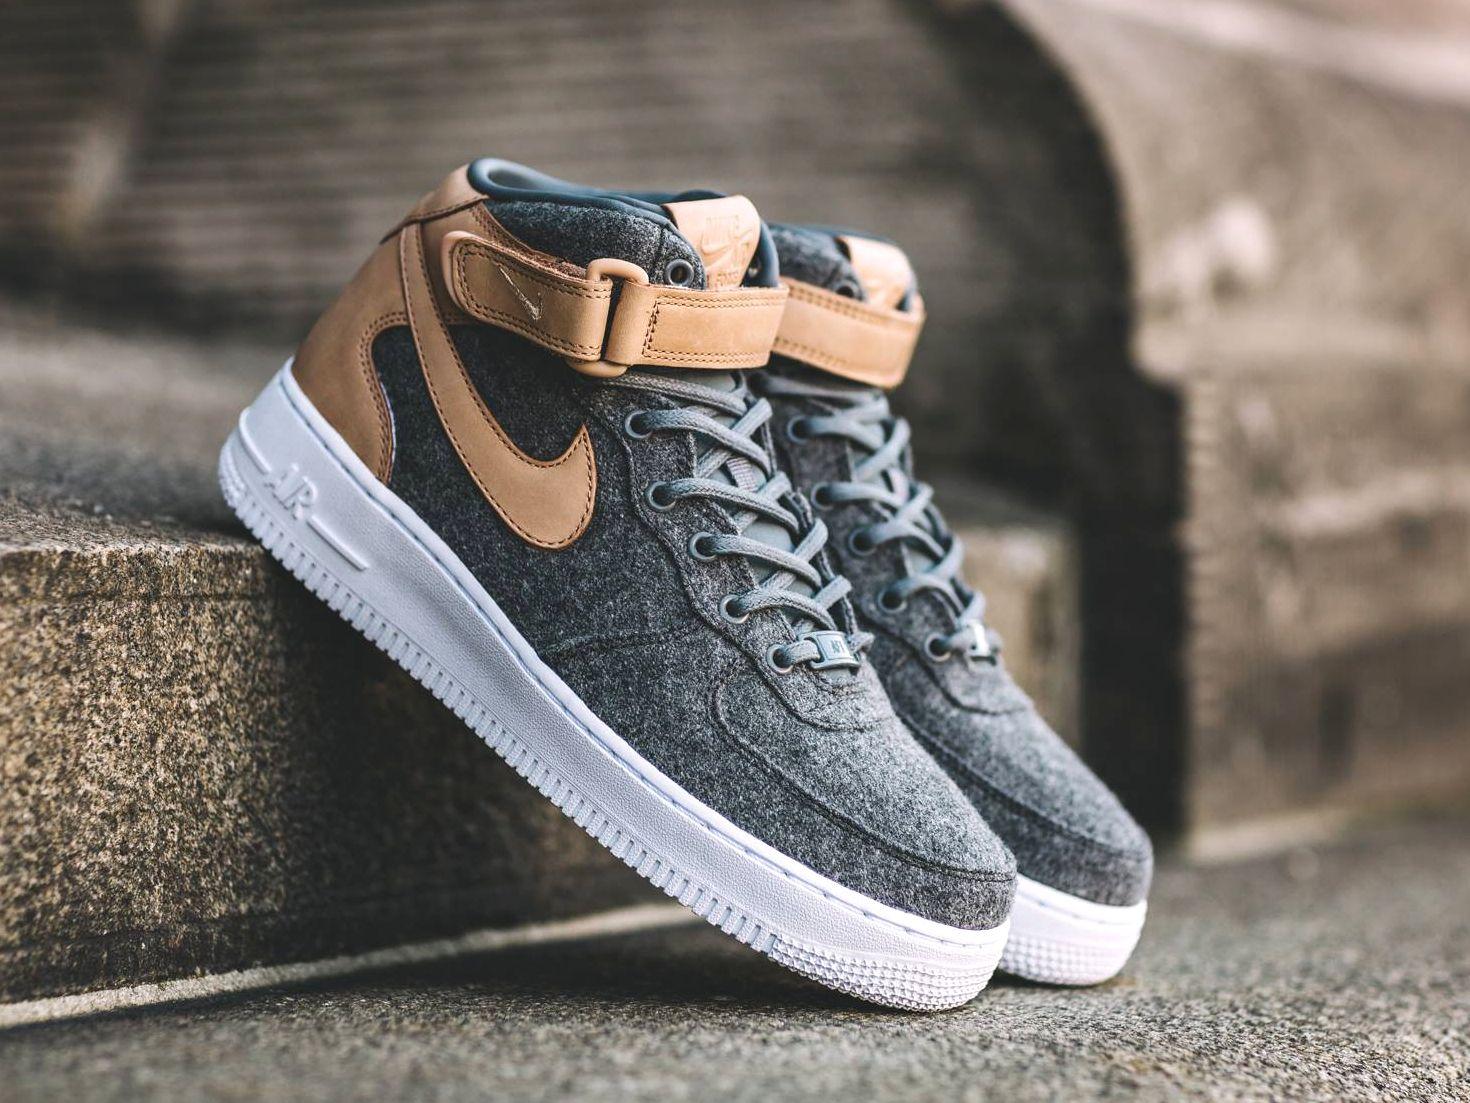 Wool 1 Oatmeal 07 Leather Mid Avis Air Nike Basket Wmns Force eBxoWrdC